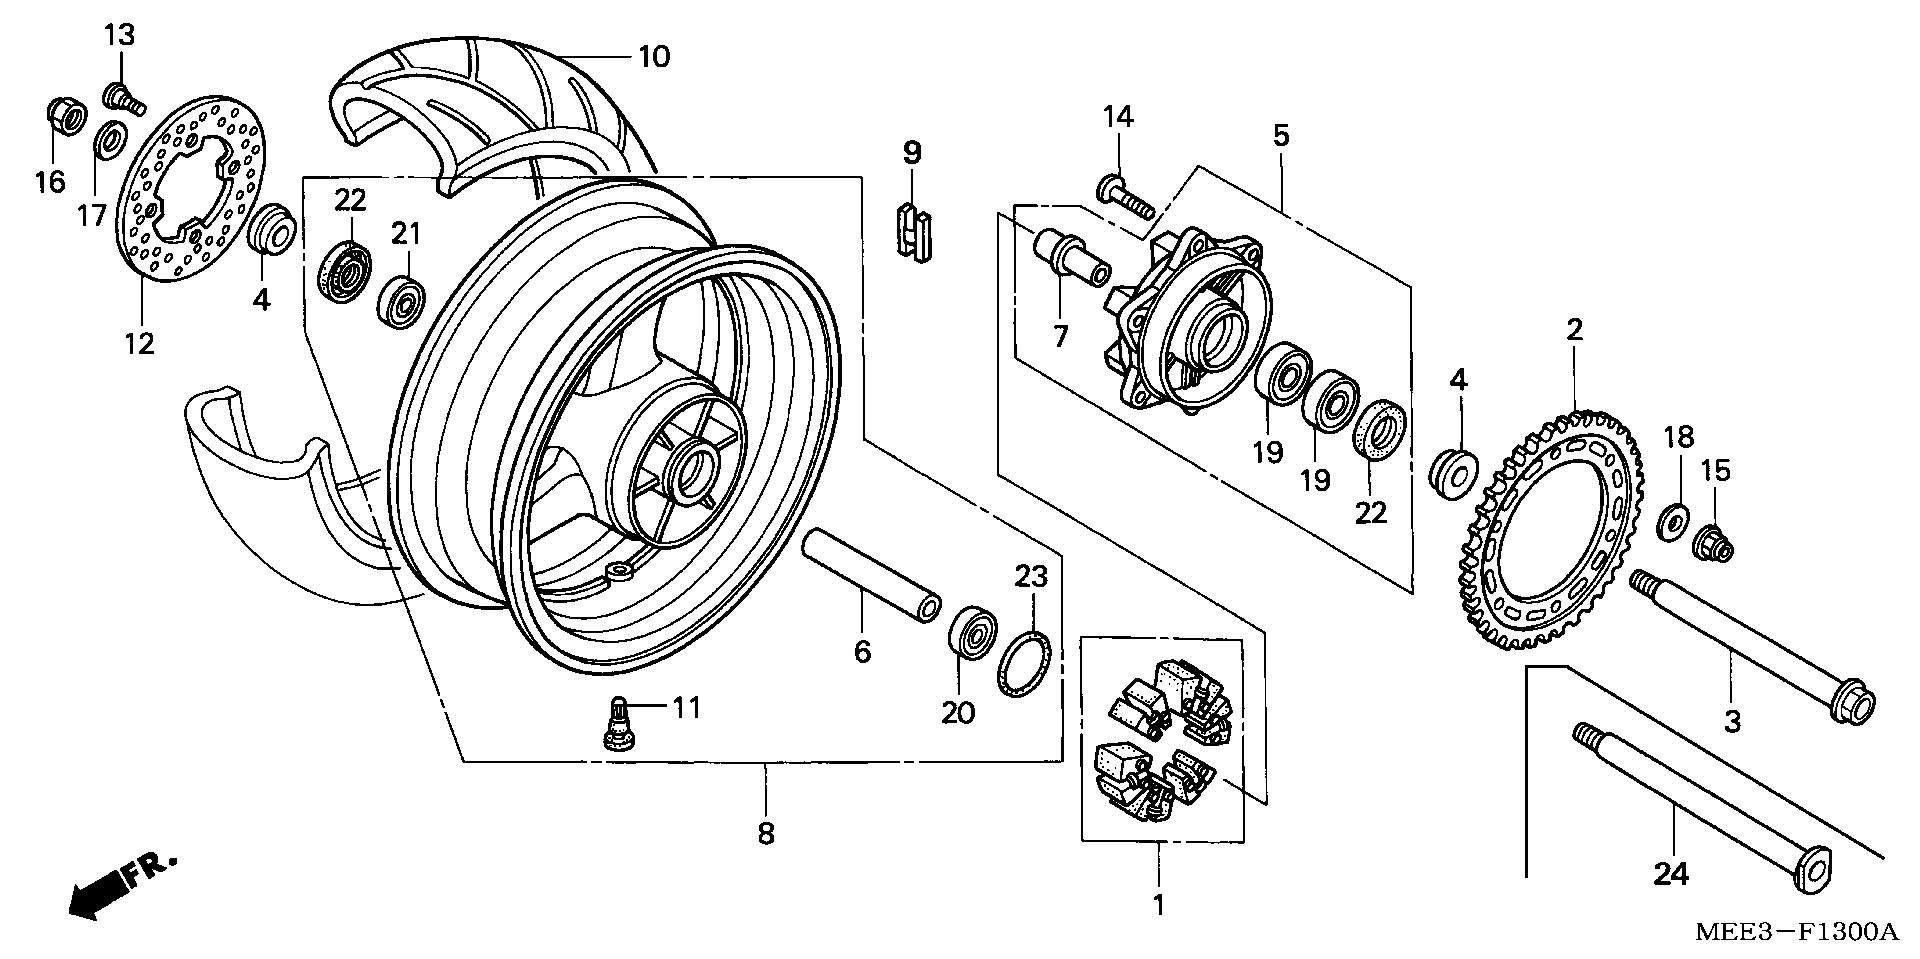 Honda Cbr 600 Wiring Diagram